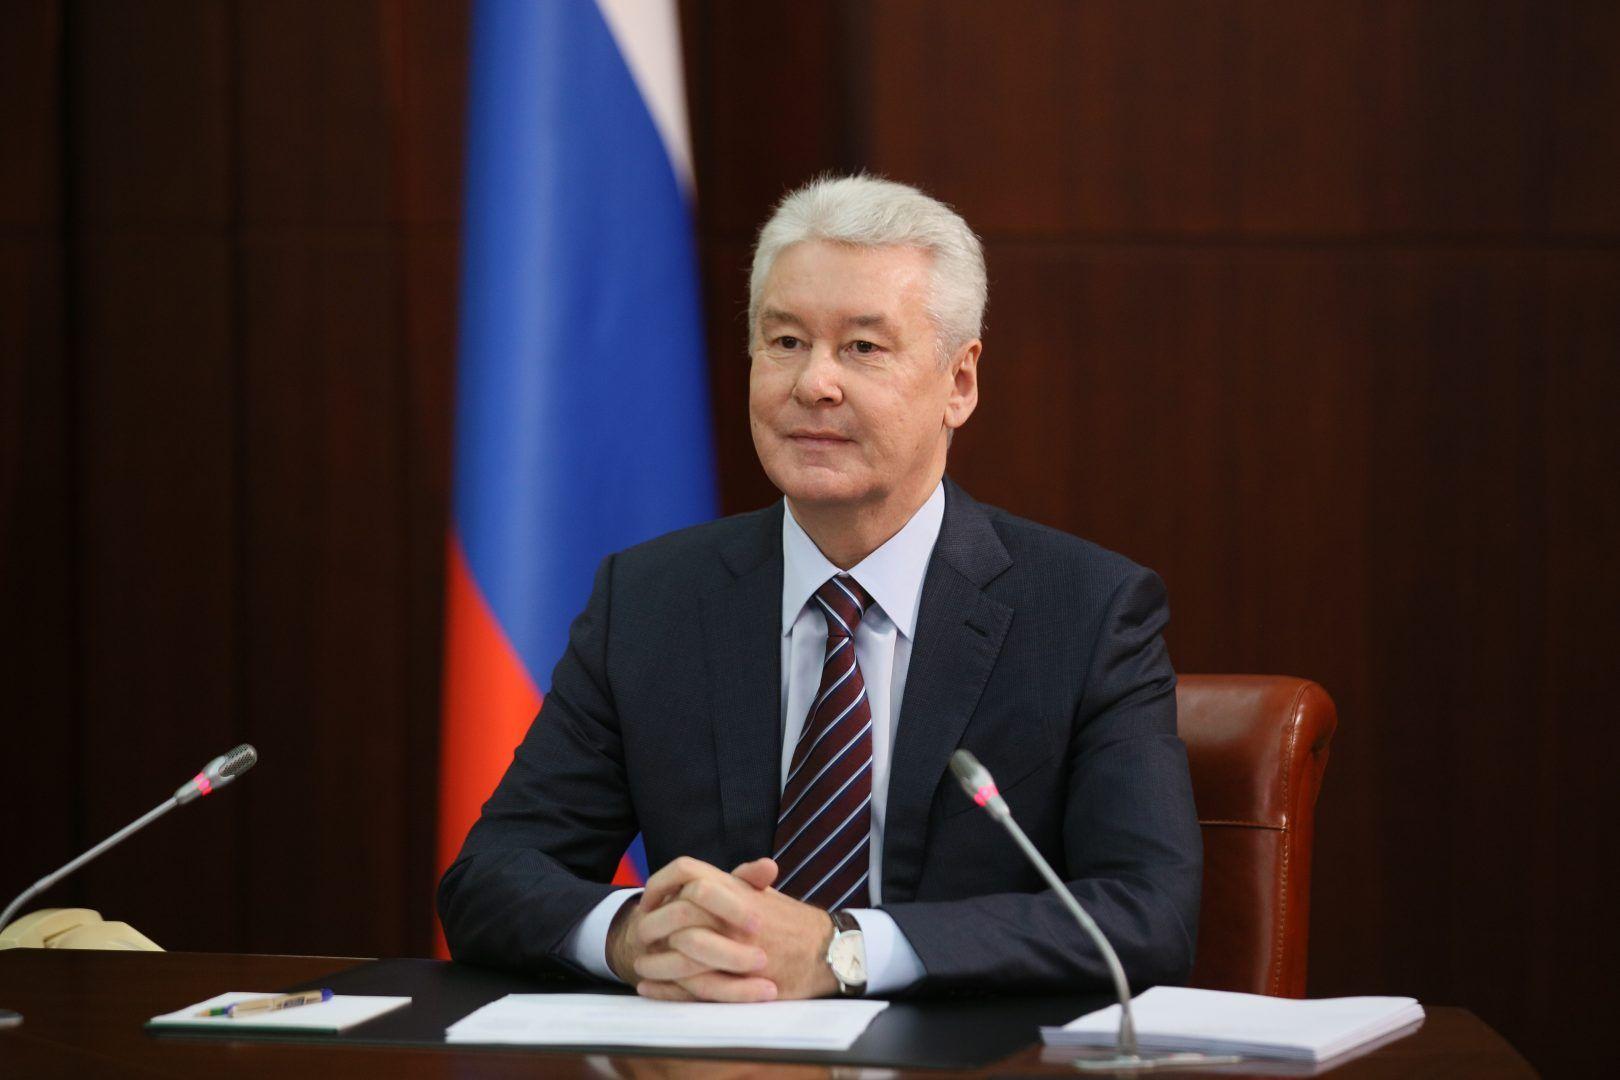 Мэр Москвы Сергей Собянин. Фото: Антон Гердо